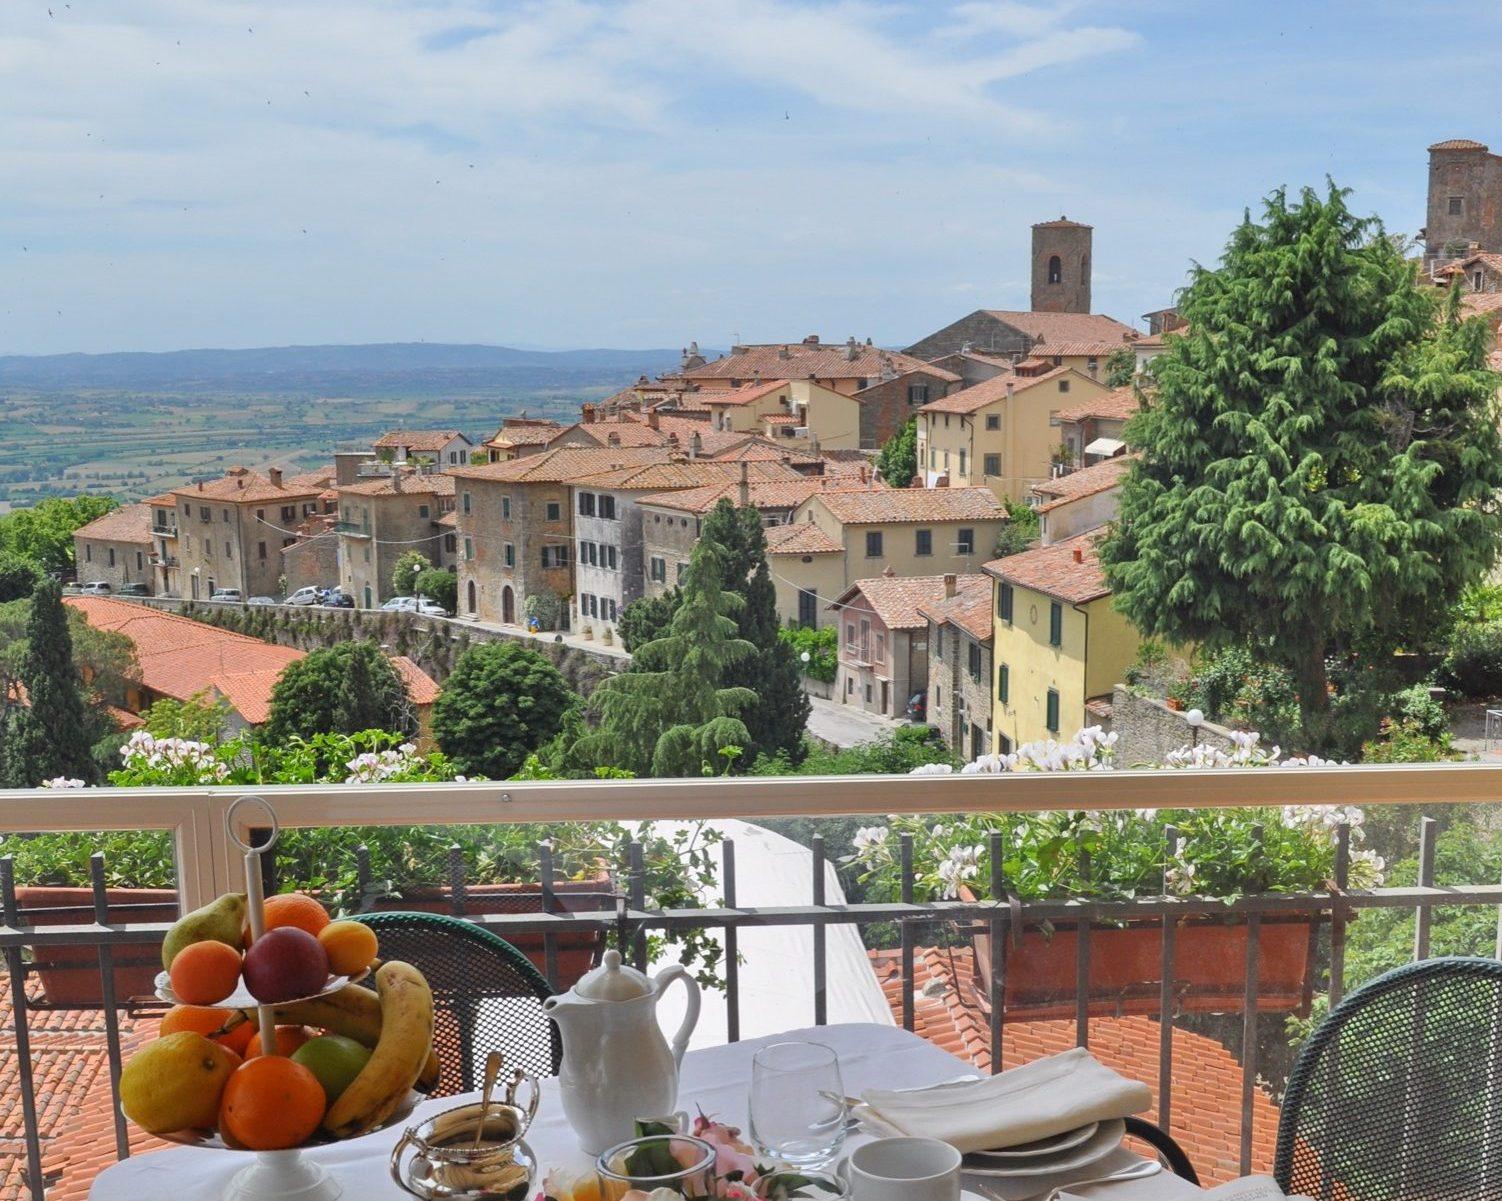 Cortona photography course hotel